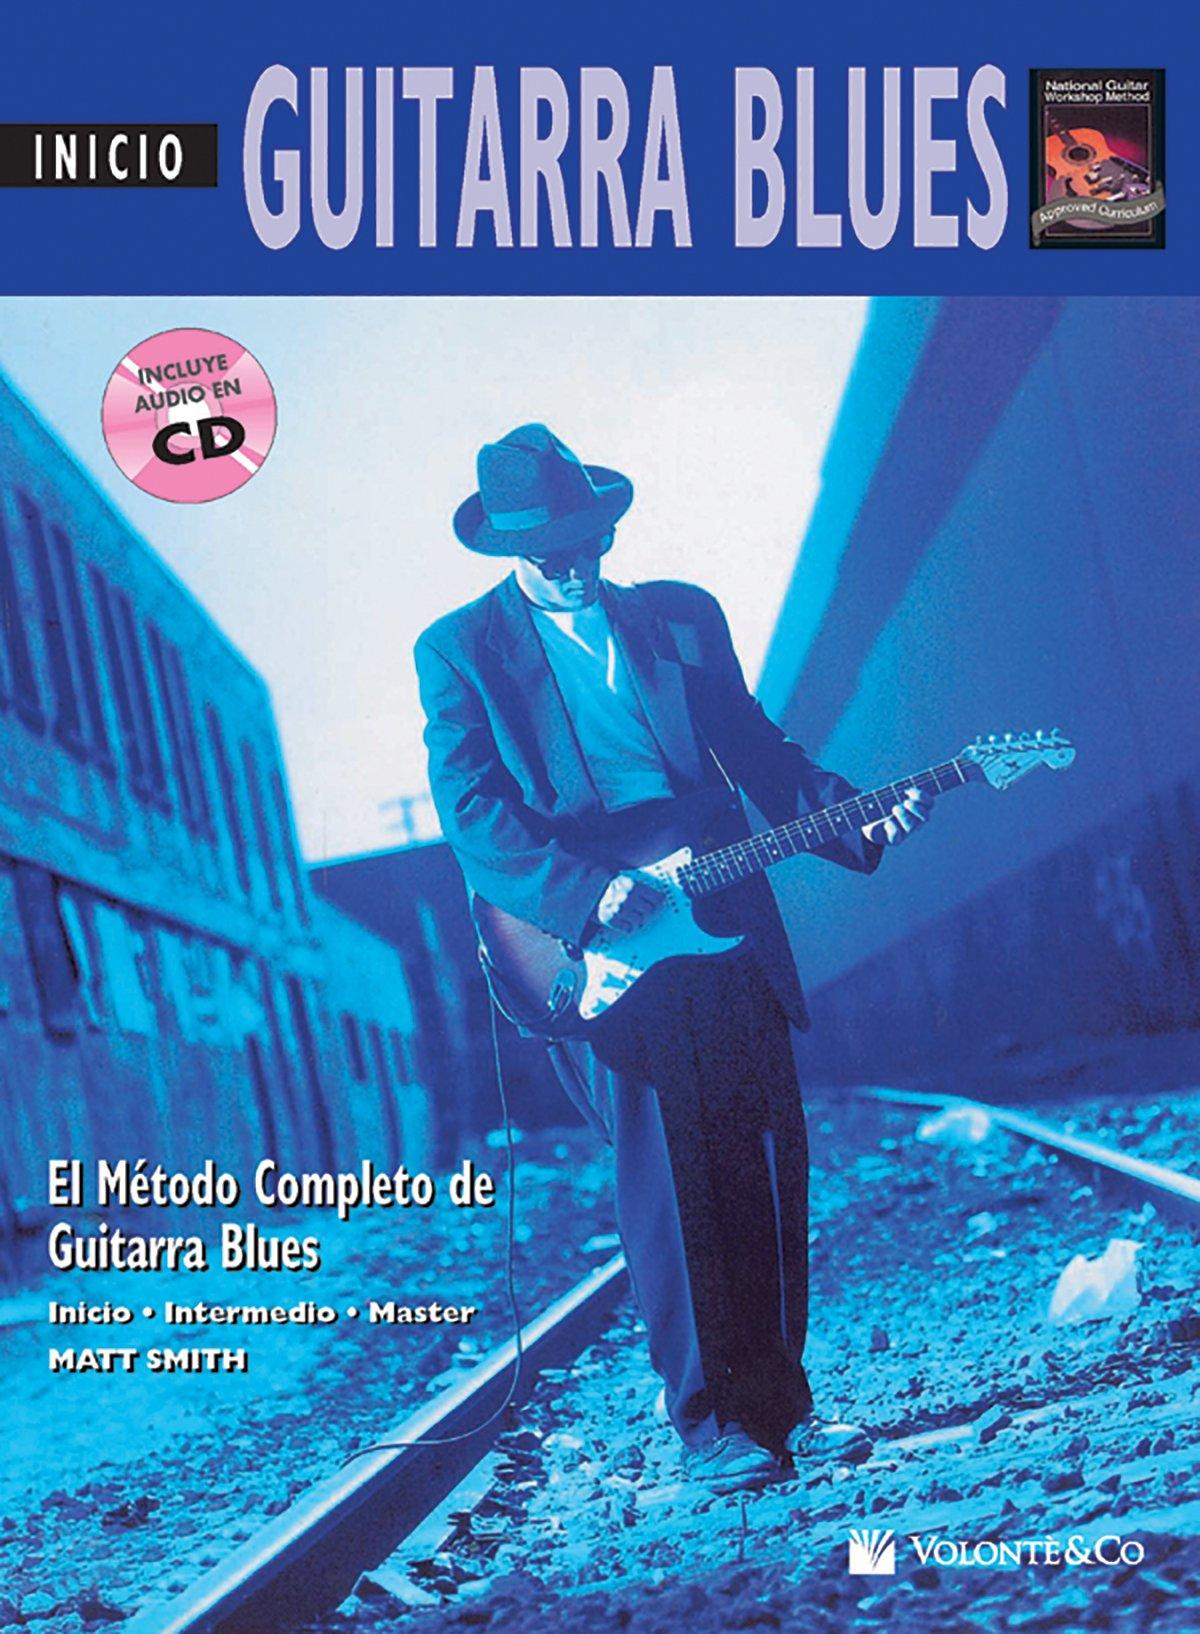 GUITARRA BLUES INICIO + CD (Complete Method): Amazon.es: Hamburger ...